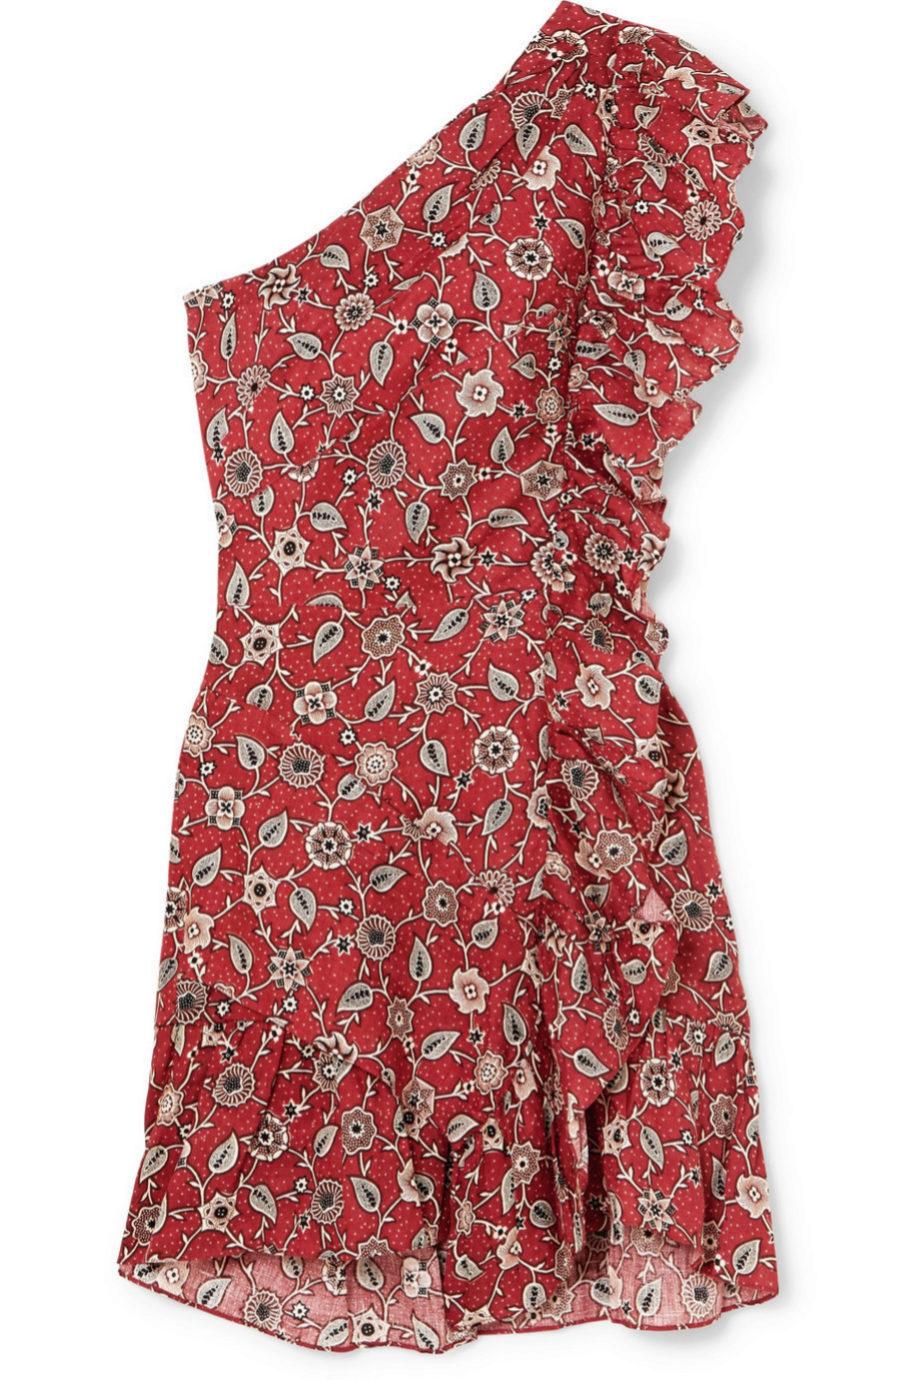 Vestido asimétrico estampado de Isabel Marant Etóile